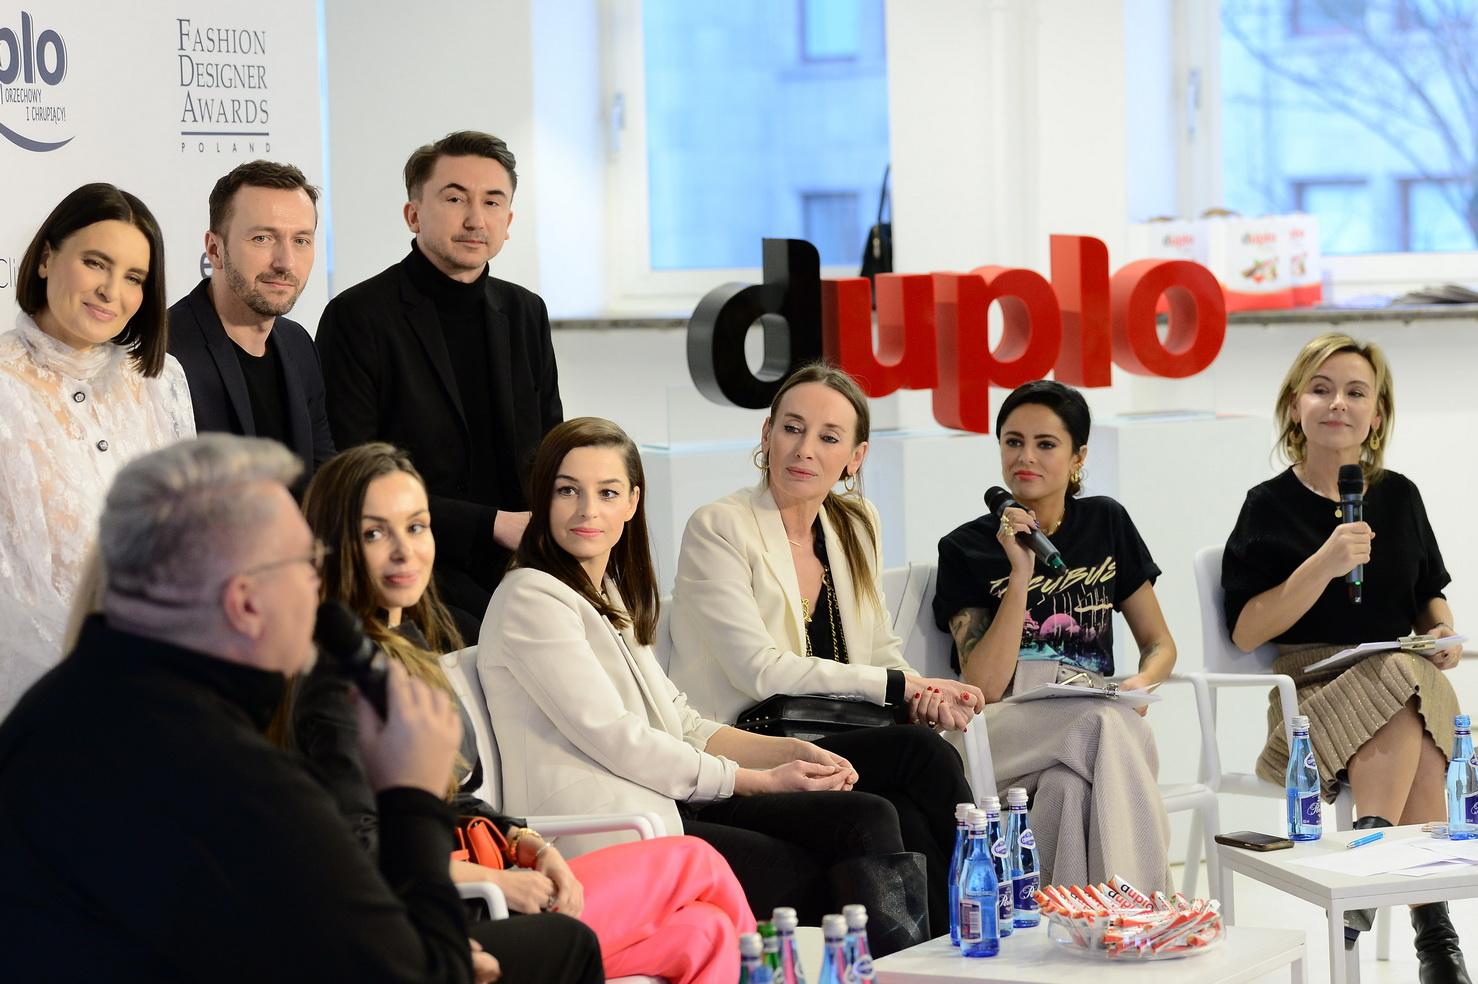 BlogStar: Ruszyła 11. edycja Fashion Designer Awards - BlogStar.pl